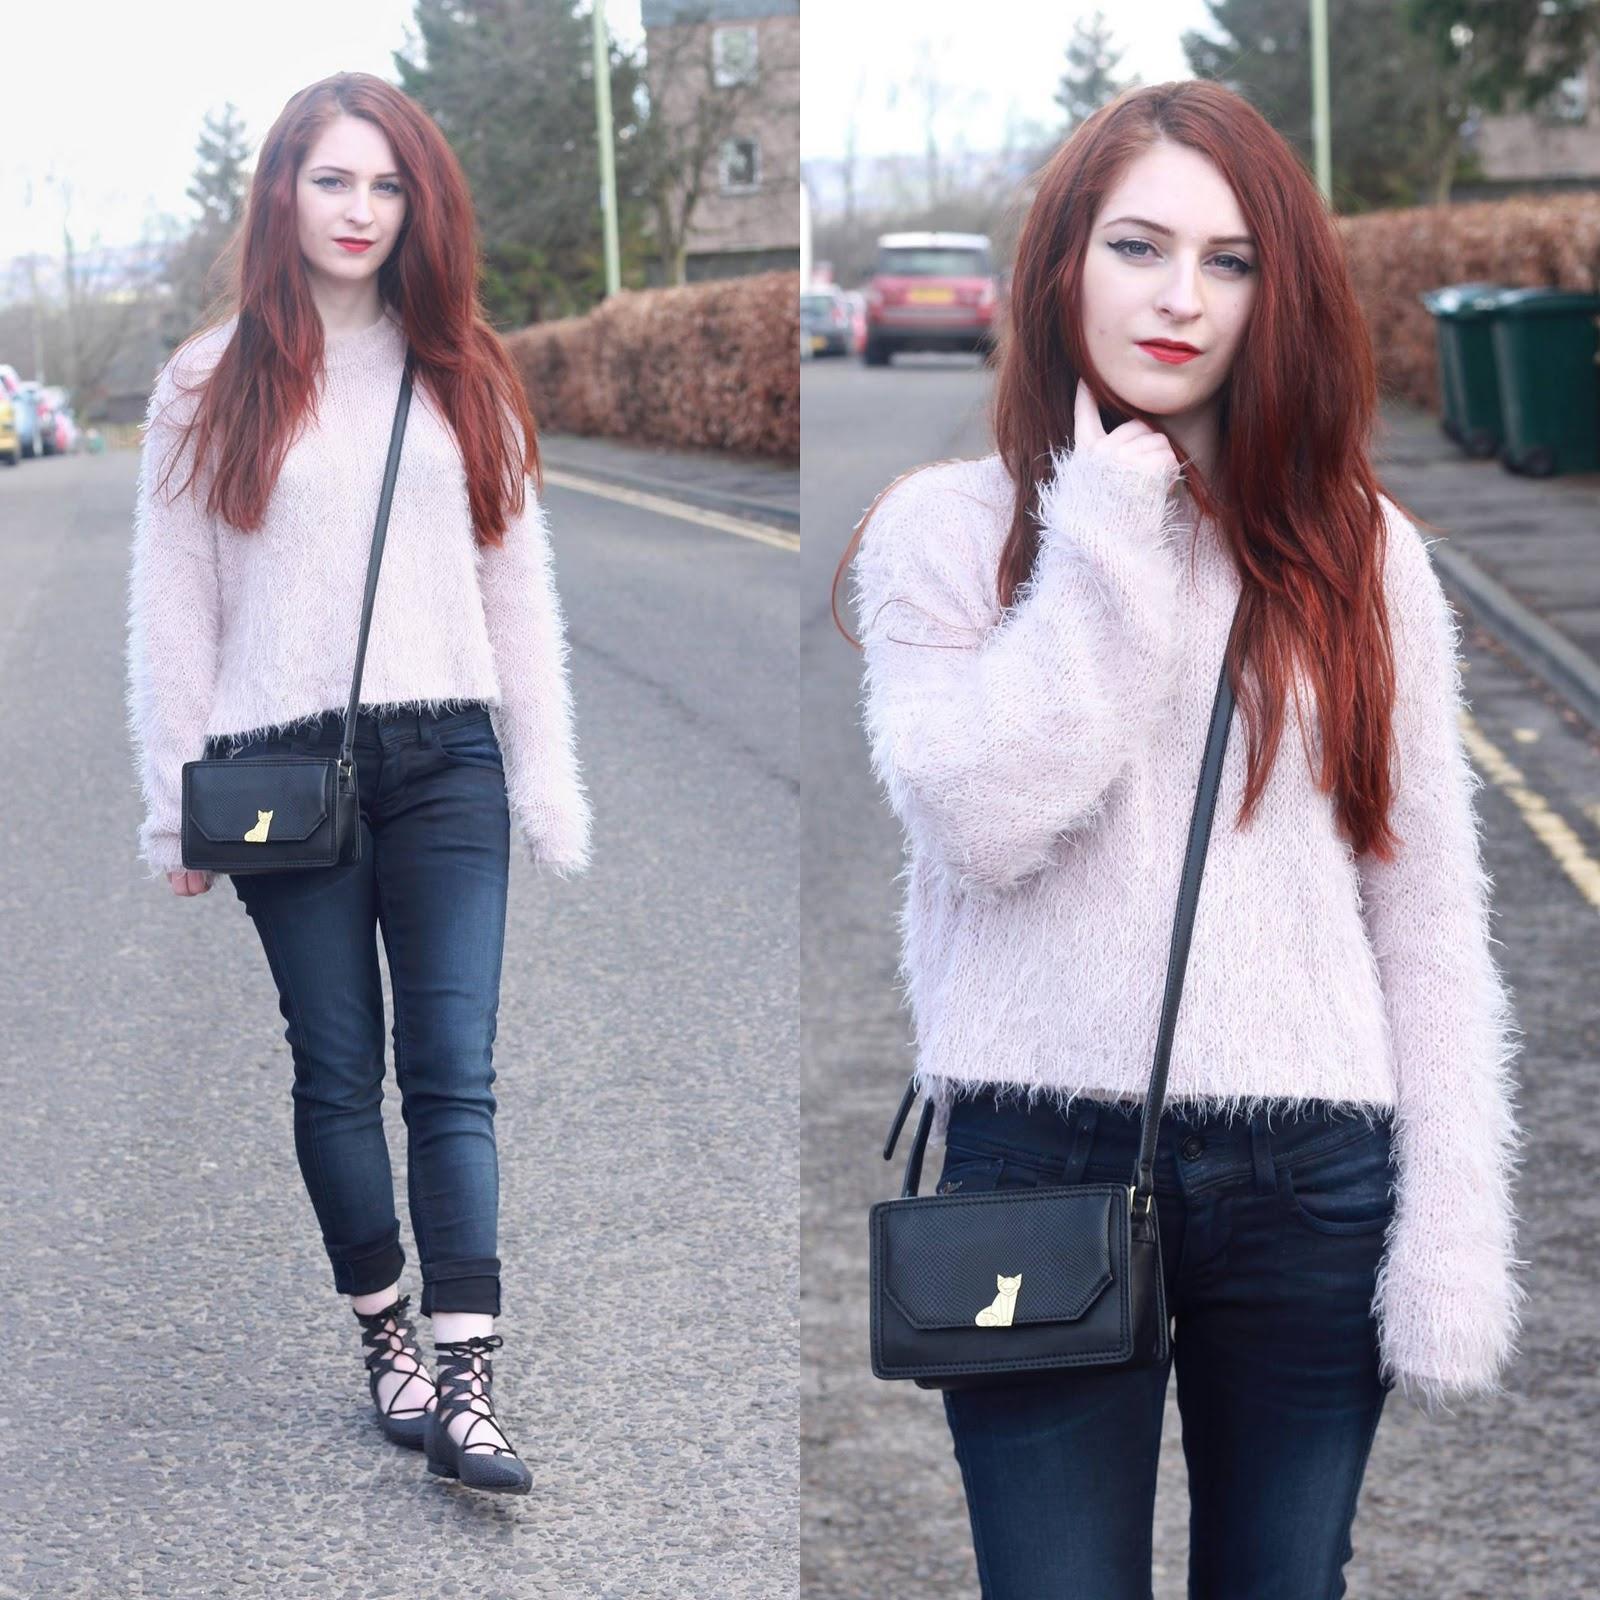 dune london, g-star raw lynn jeans, asos jumper, nica venice bag, style blog,